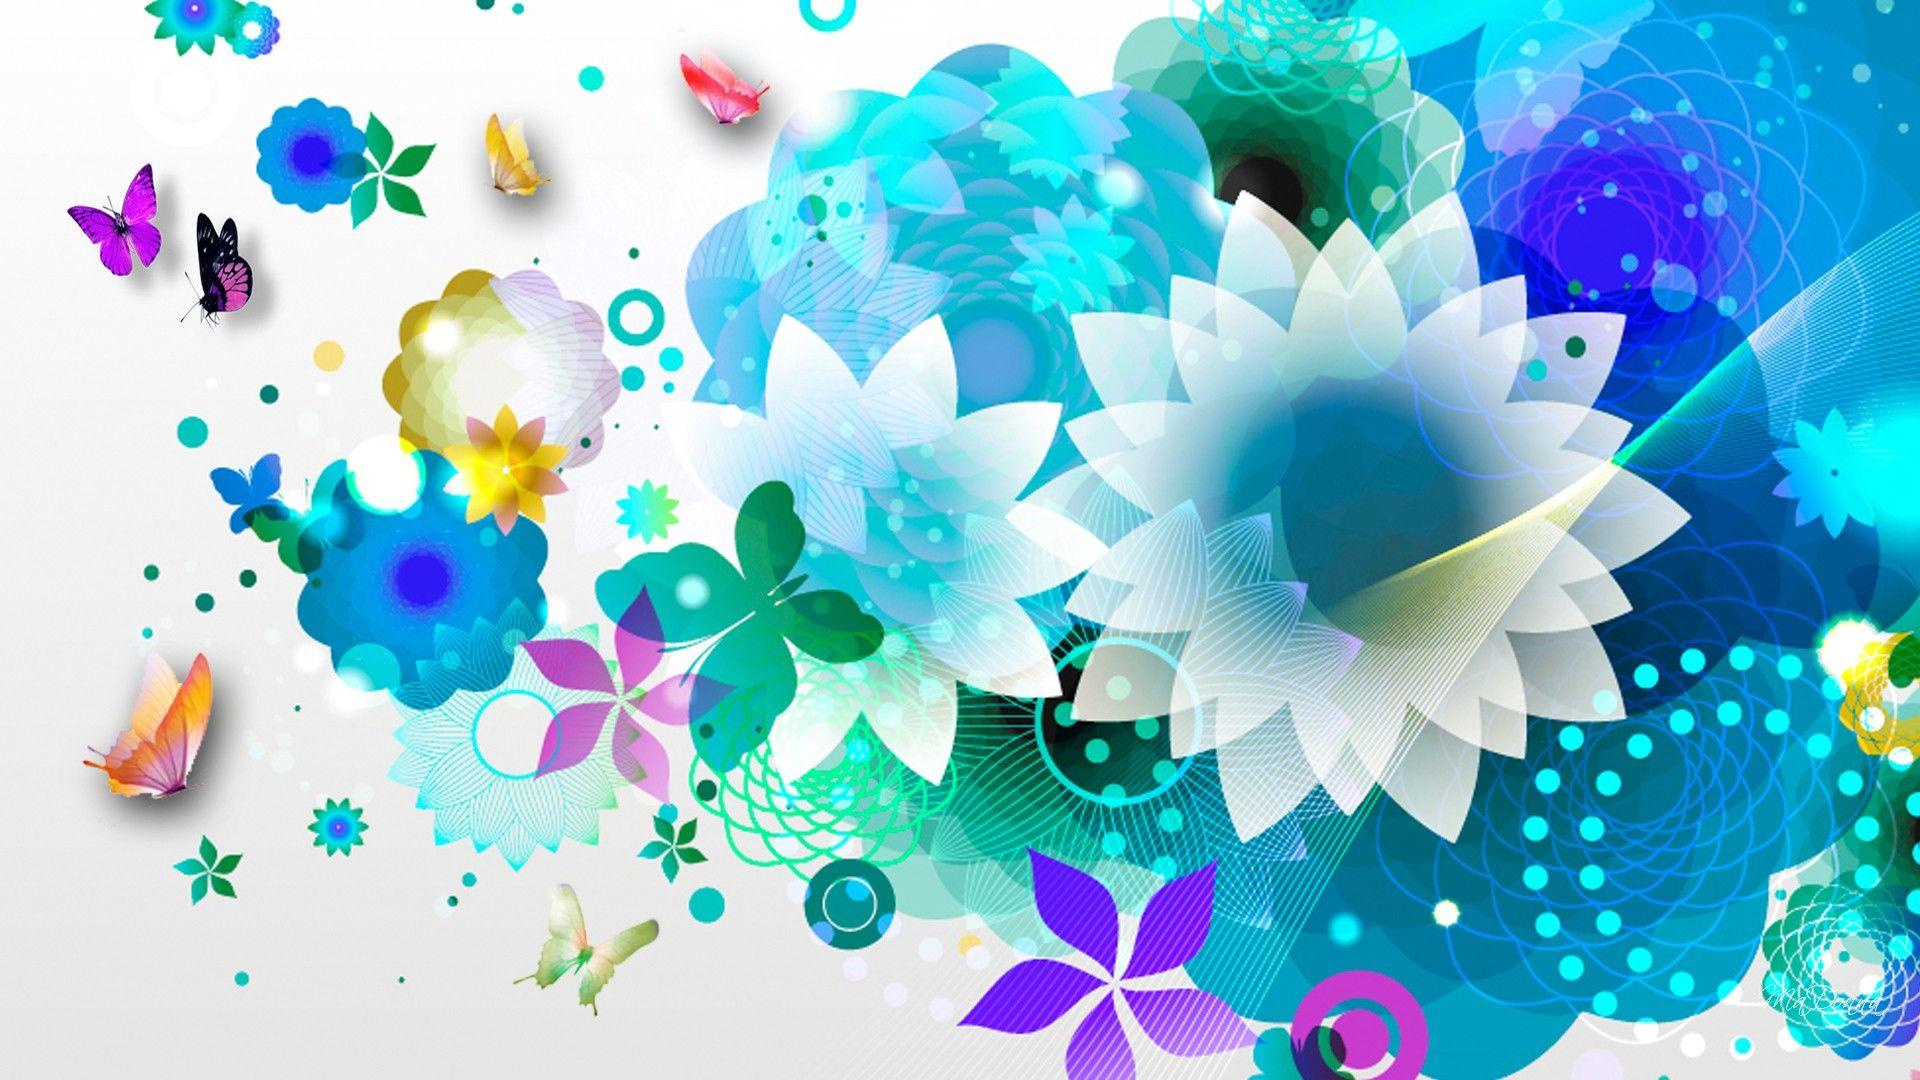 Hd Blue Flower Abstraction Wallpaper Download Free 83581 Portadas